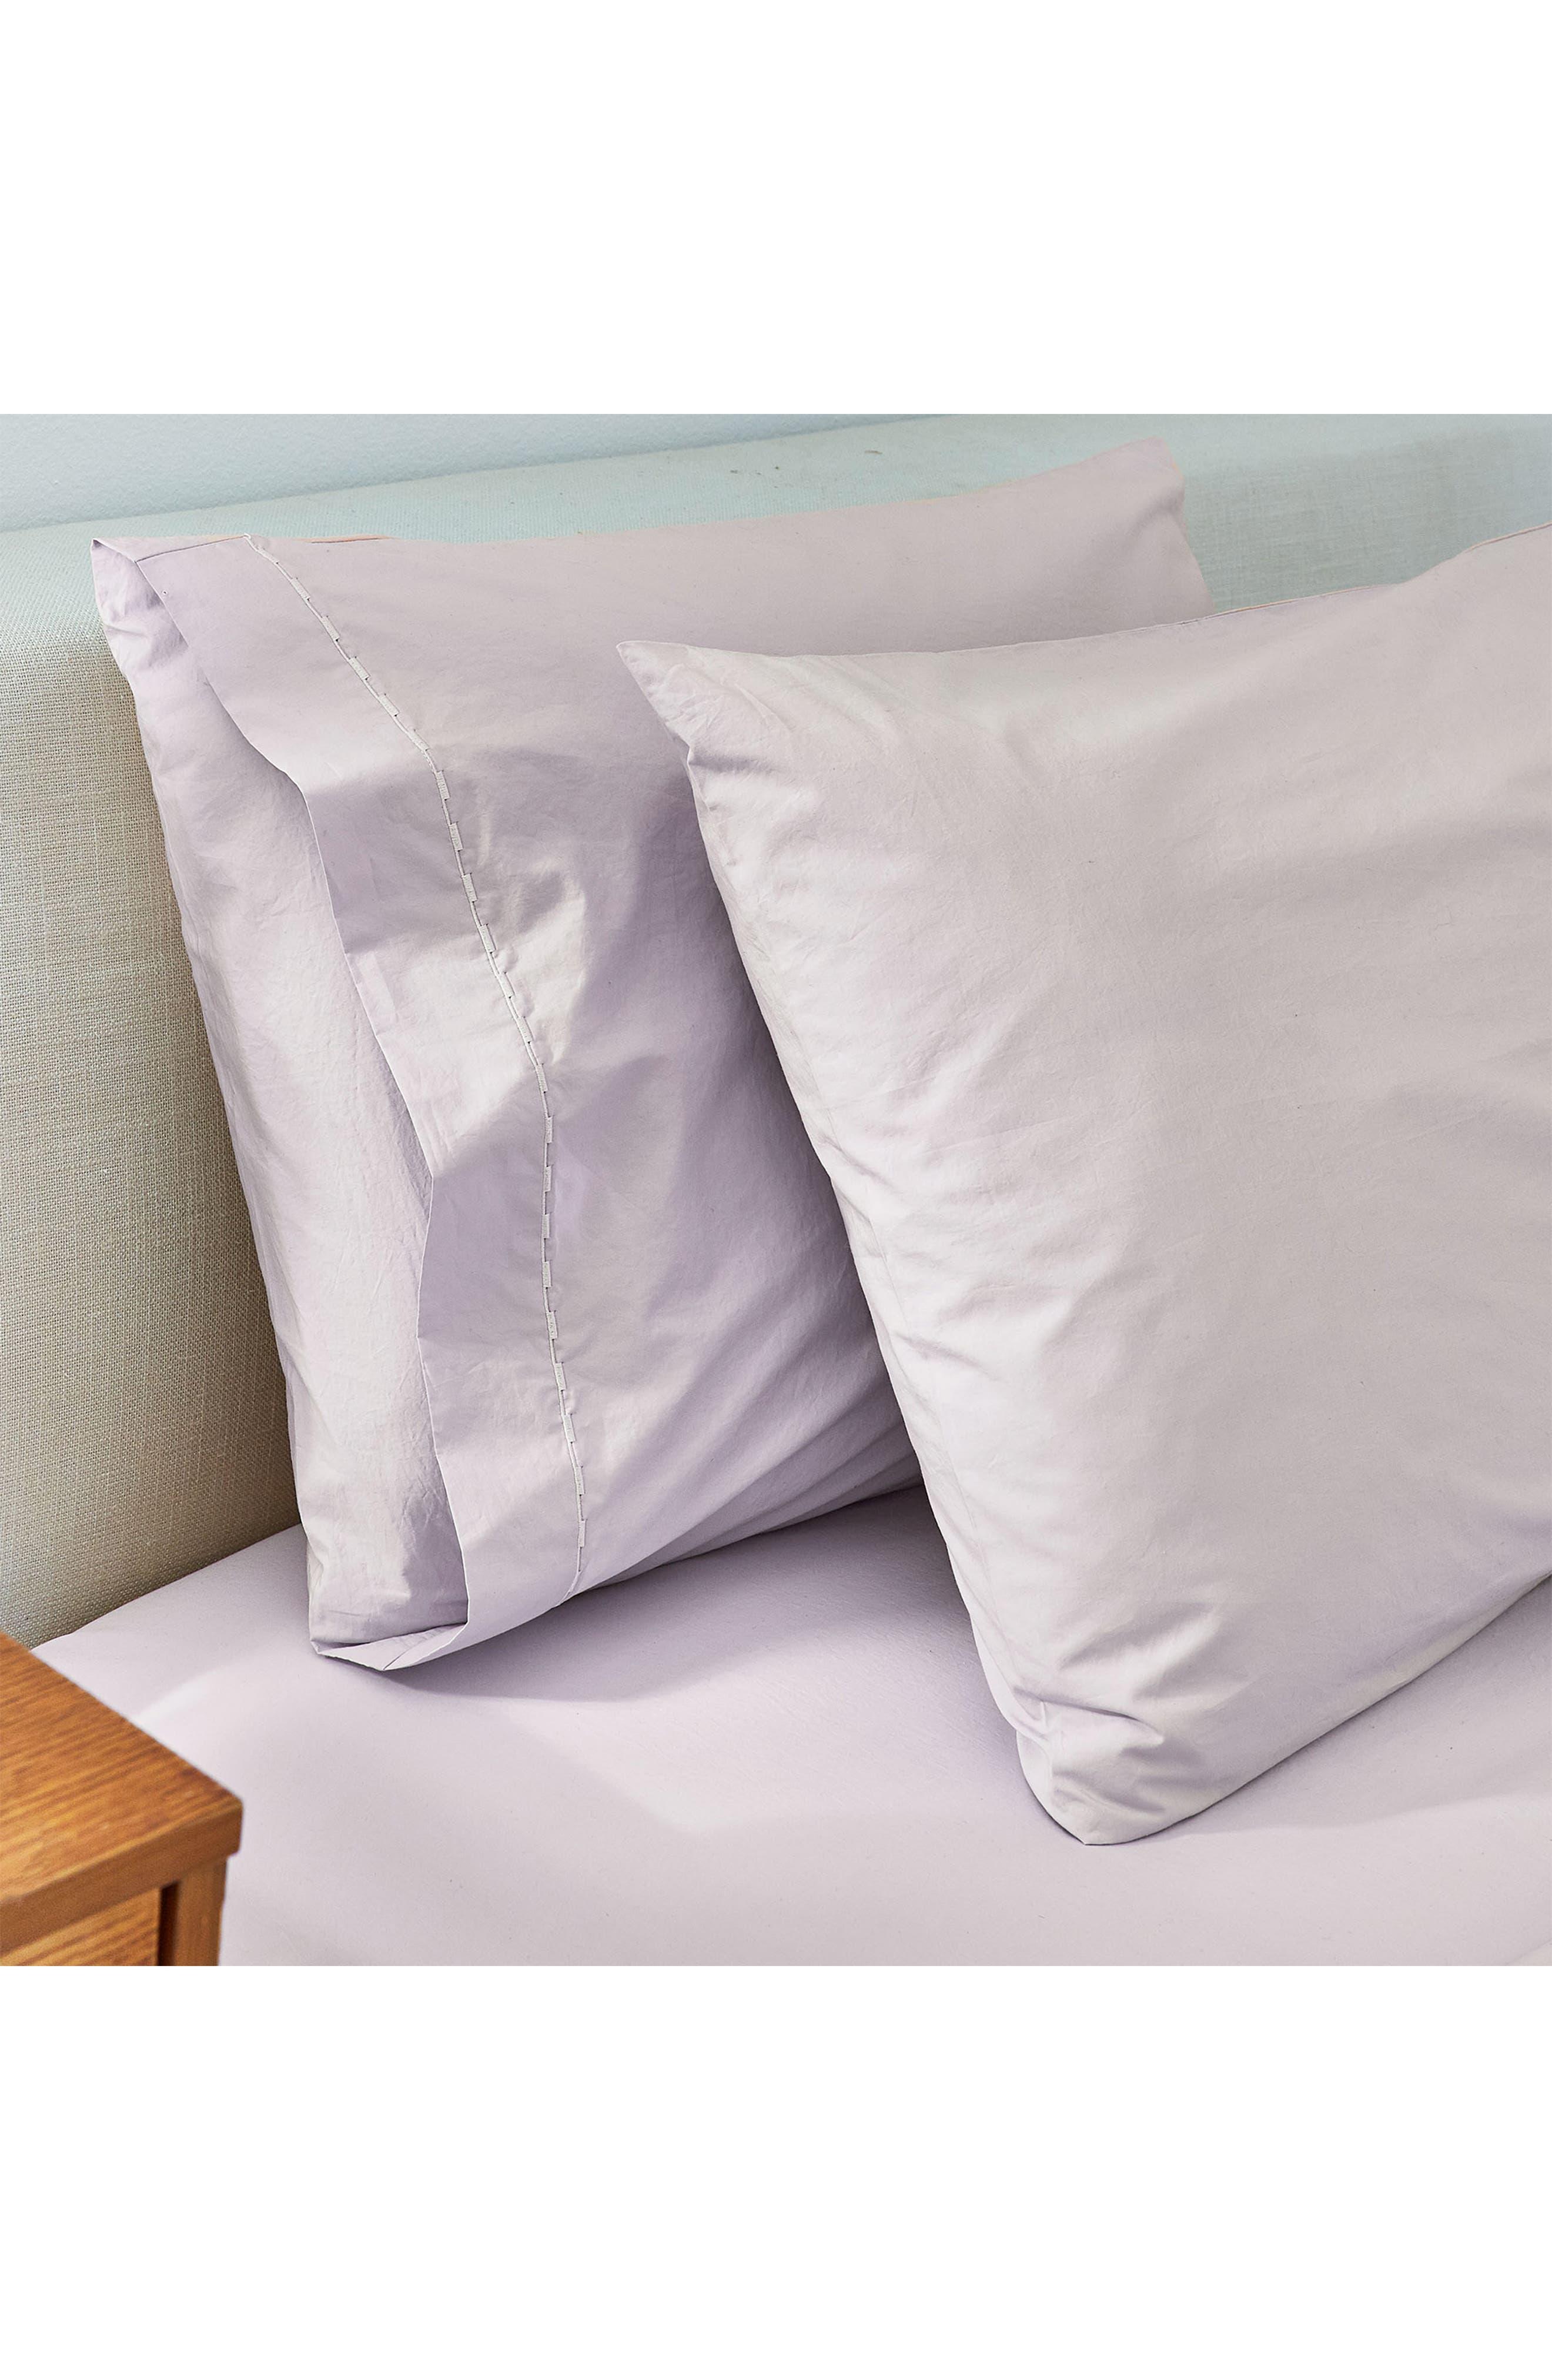 SPLENDID HOME DECOR, Spendid Home Decor Cotton Percale Pillowcases, Main thumbnail 1, color, 027